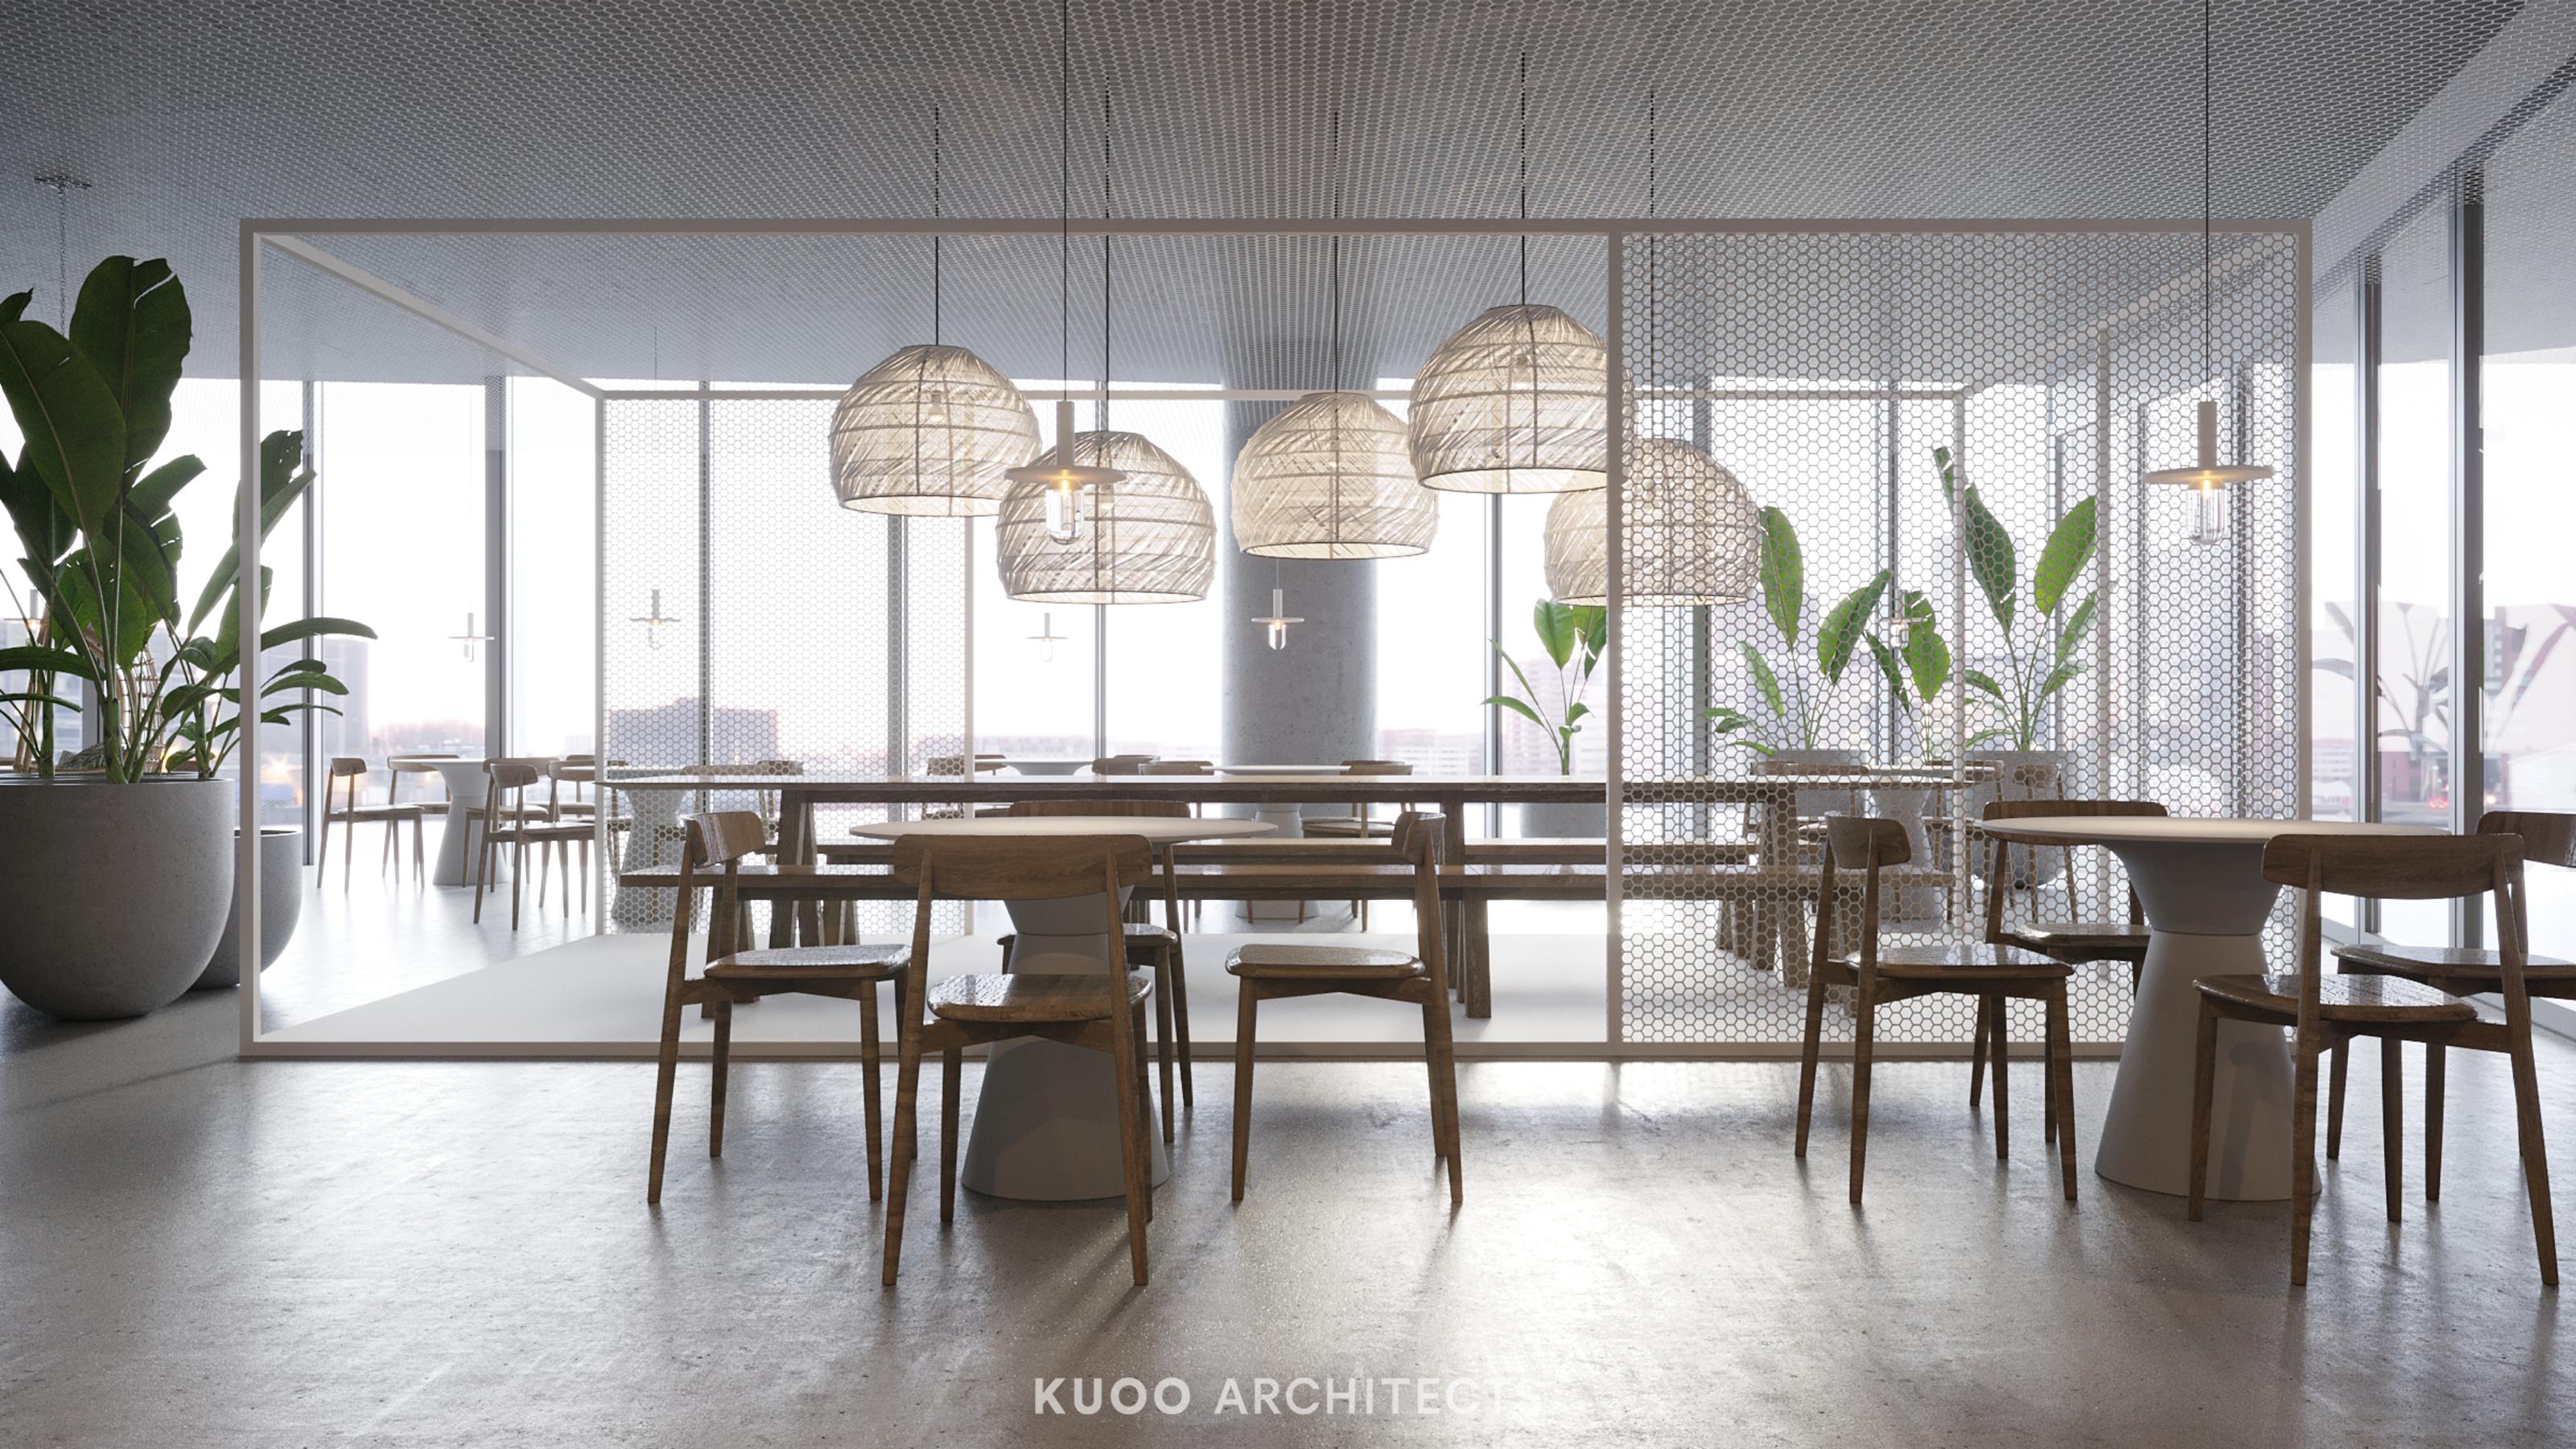 kuoo_architects_mcafe_6